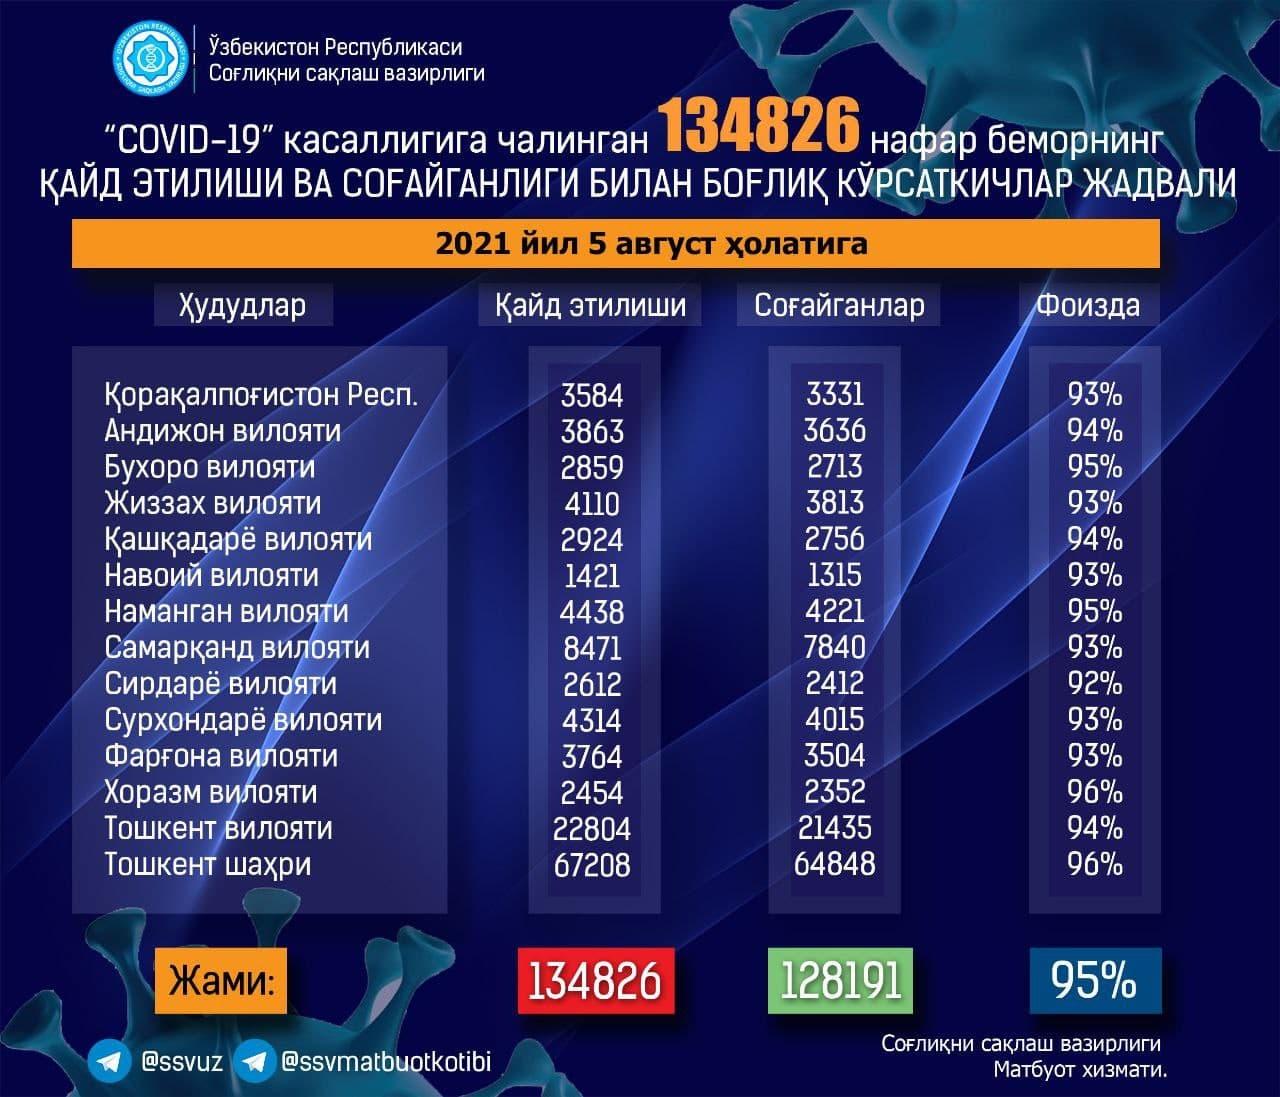 В Узбекистане за сутки почти тысяча человек заразились коронавирусом — статистика